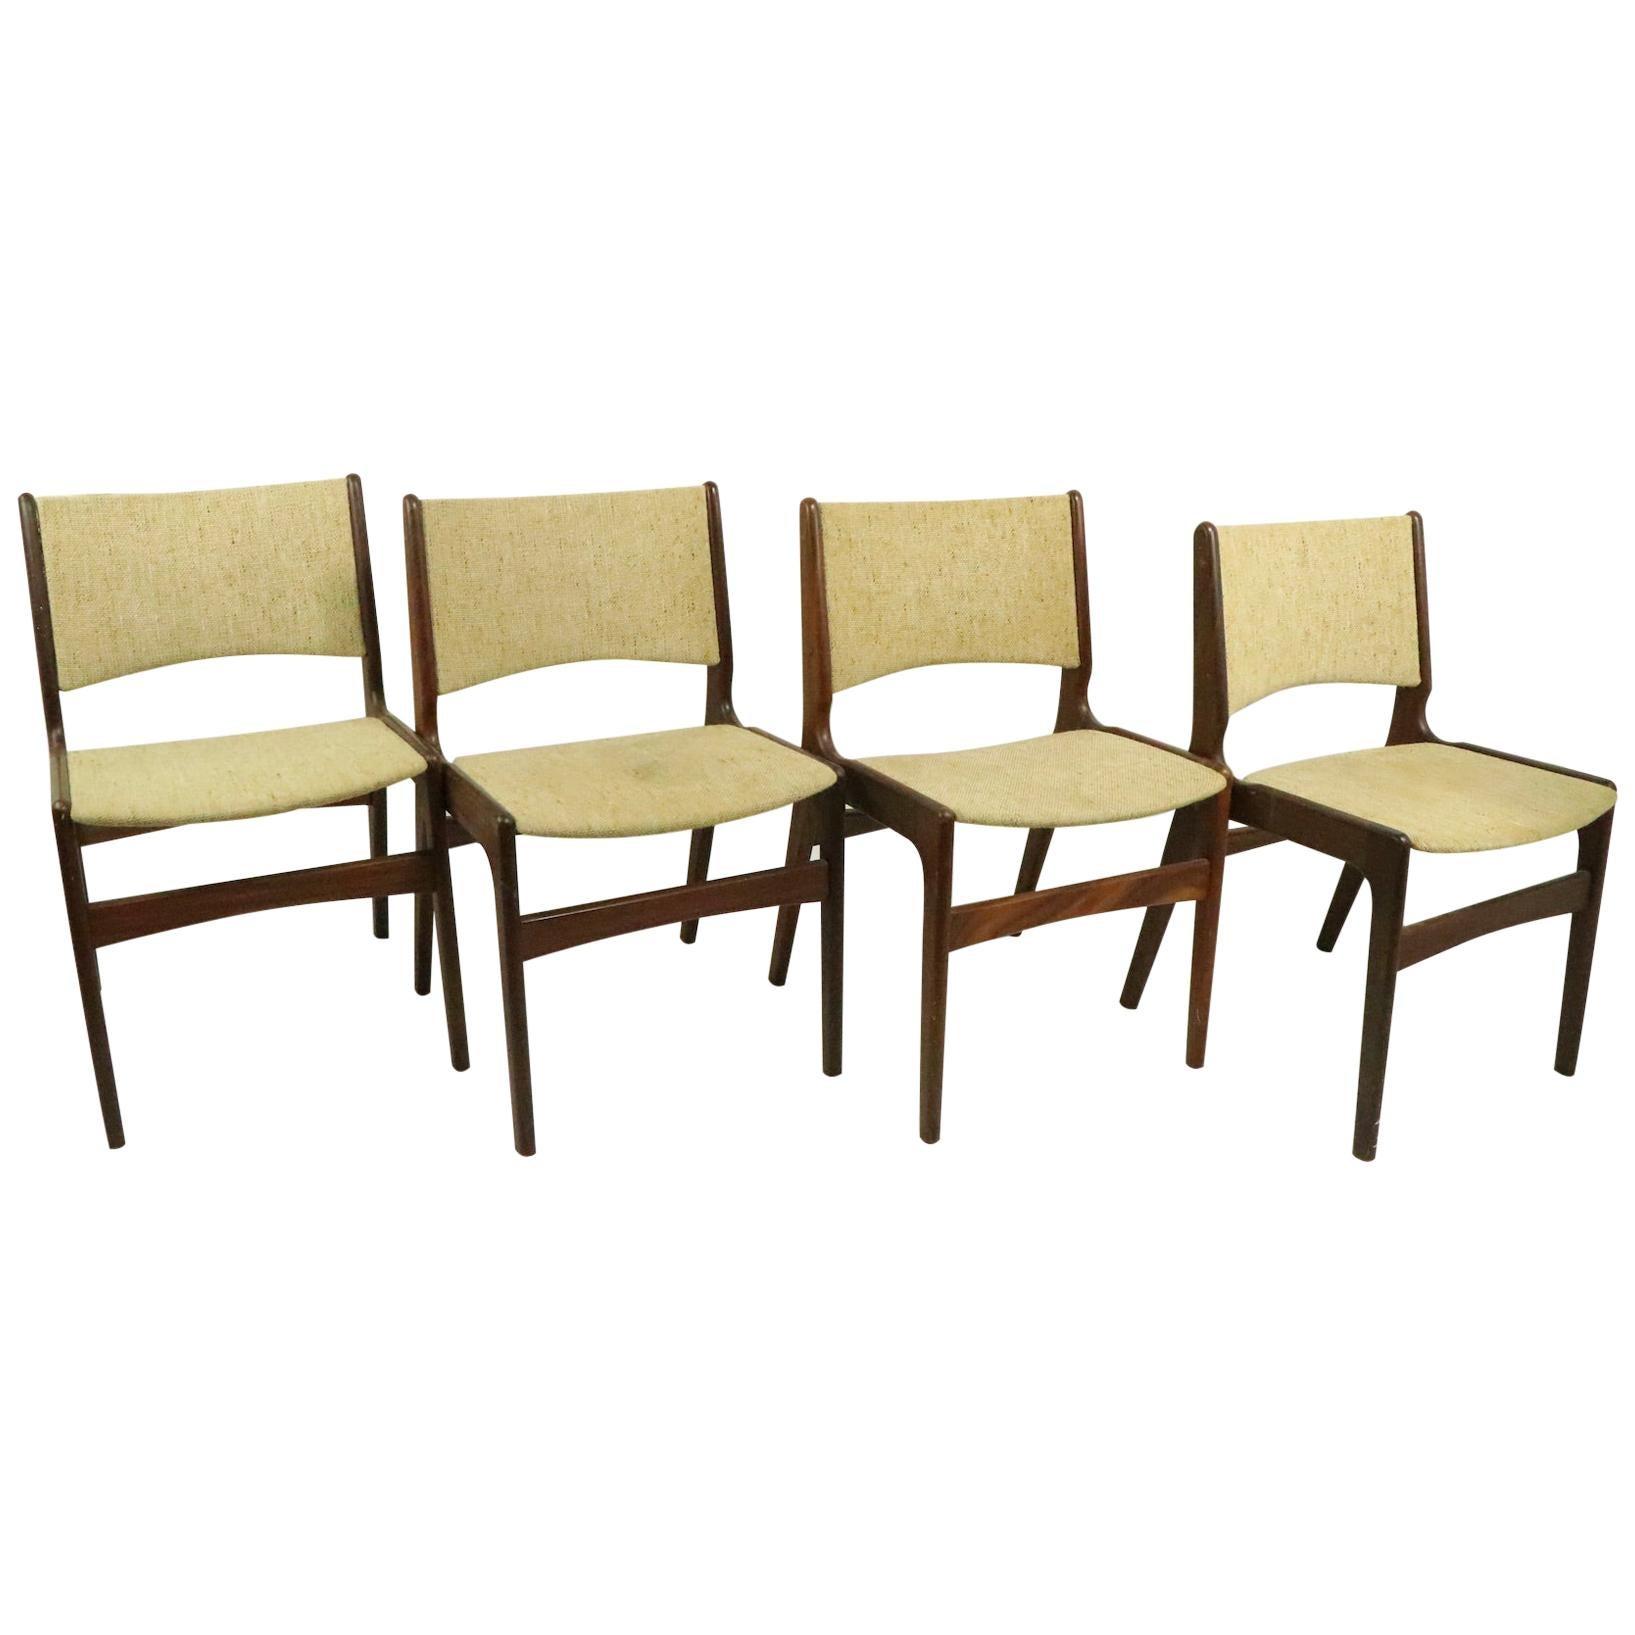 4 Danish Modern Dining Chairs by Odense Maskinsnedkeri